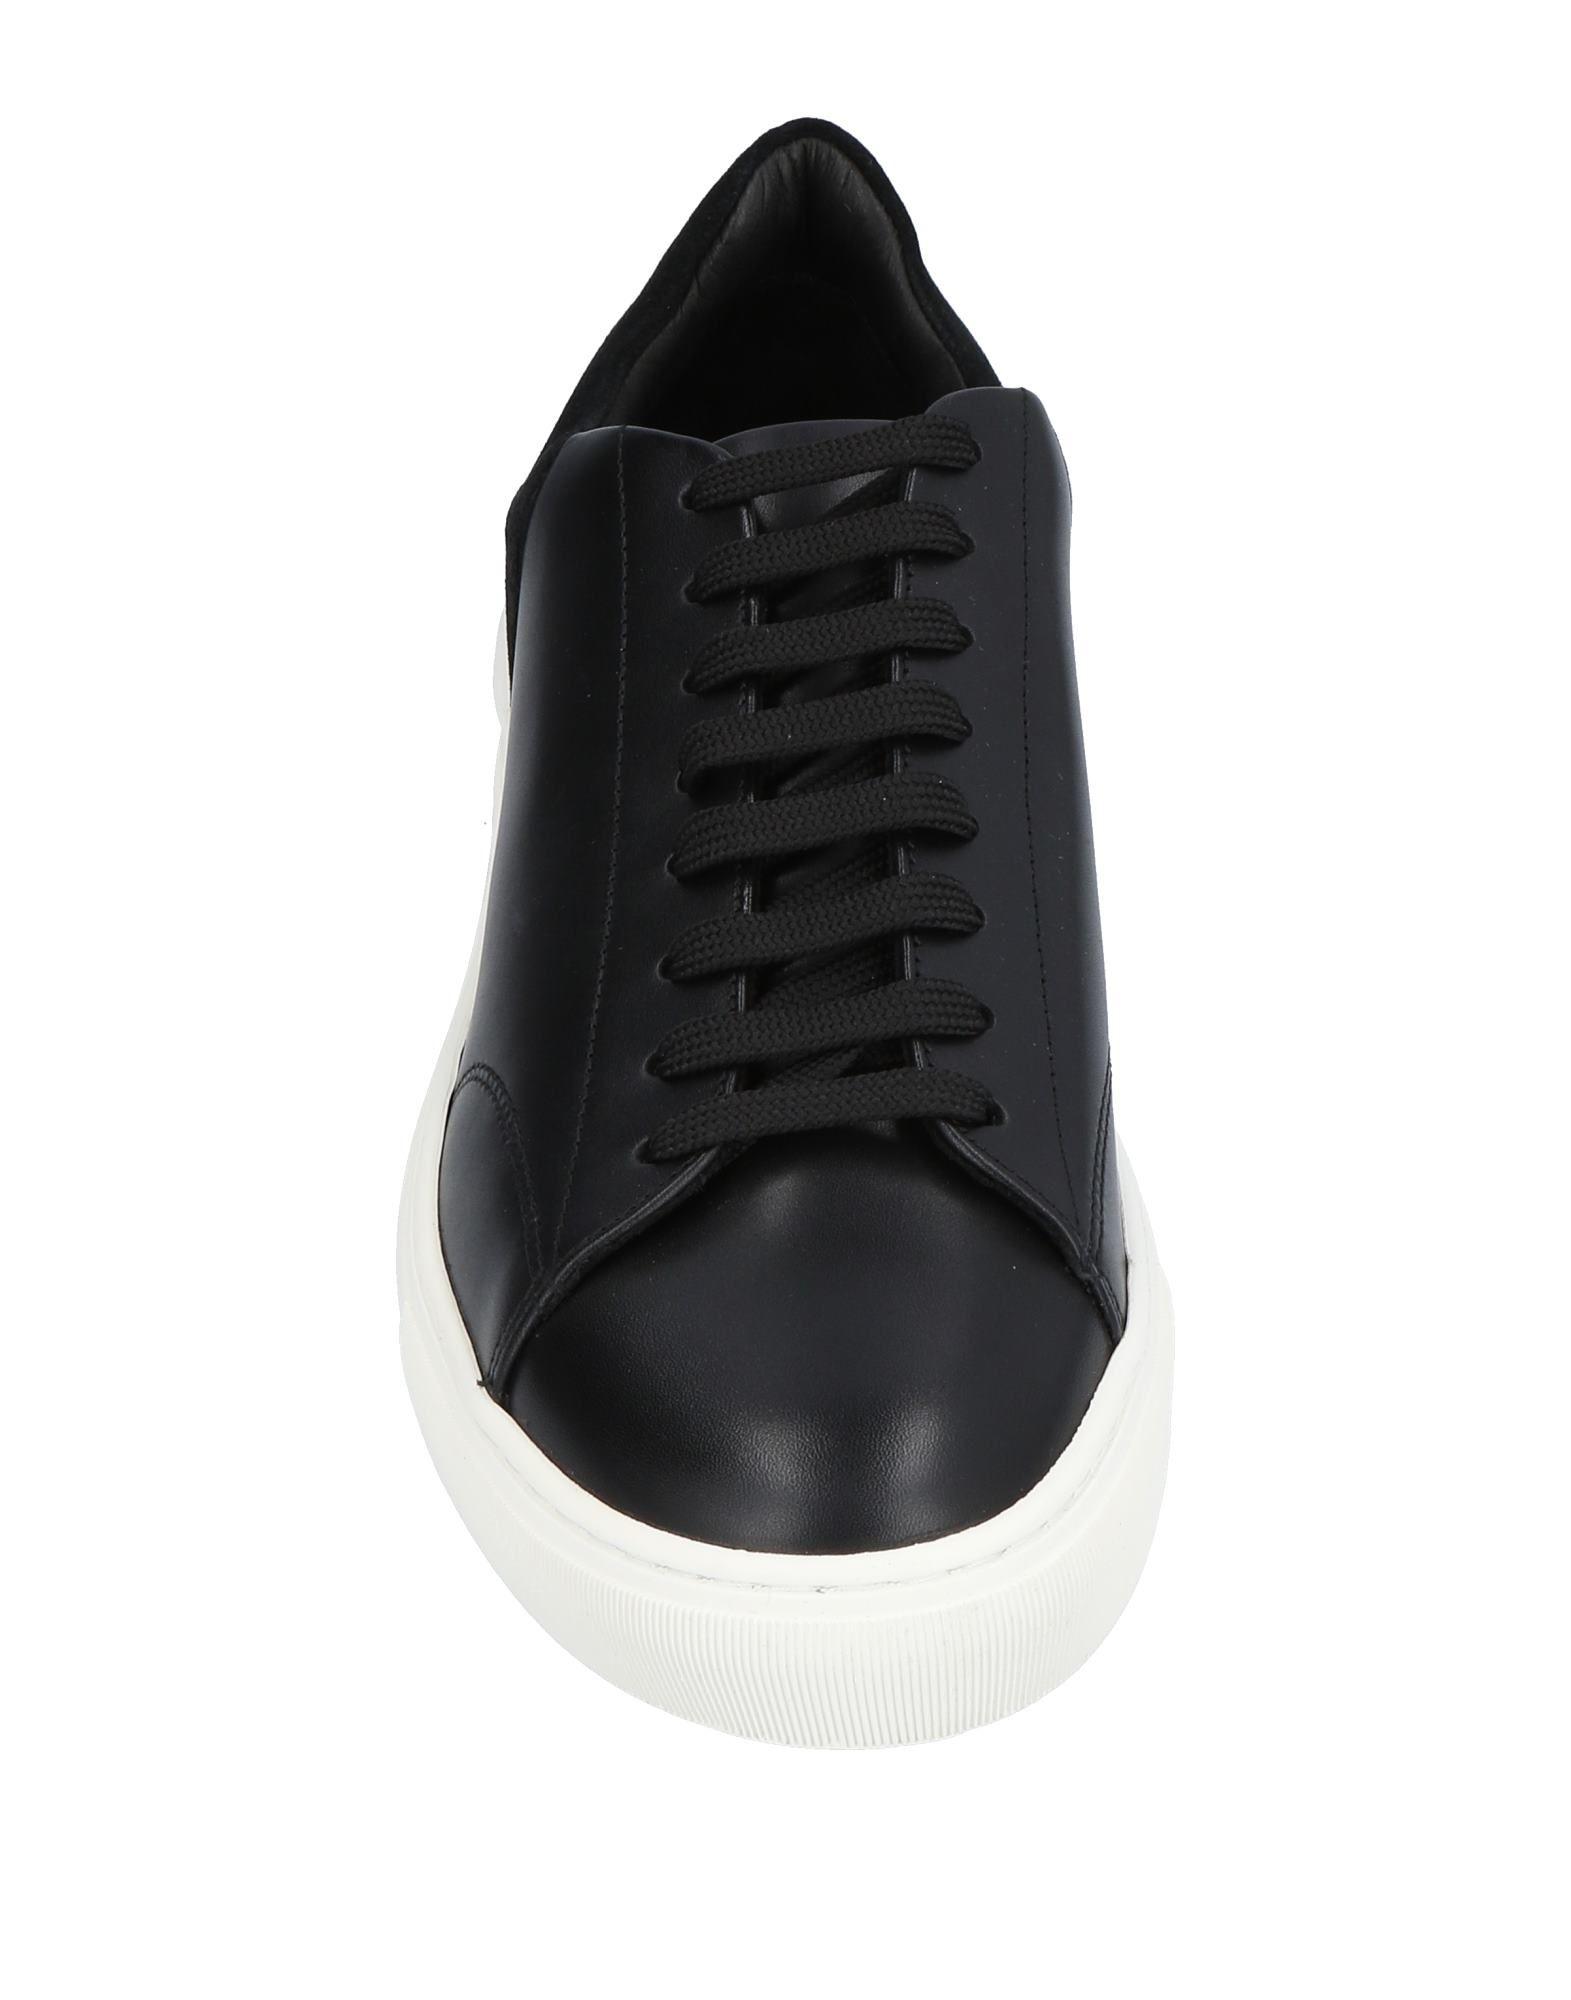 Versace Collection Sneakers Herren    11463639MK Gute Qualität beliebte Schuhe 55dd8b